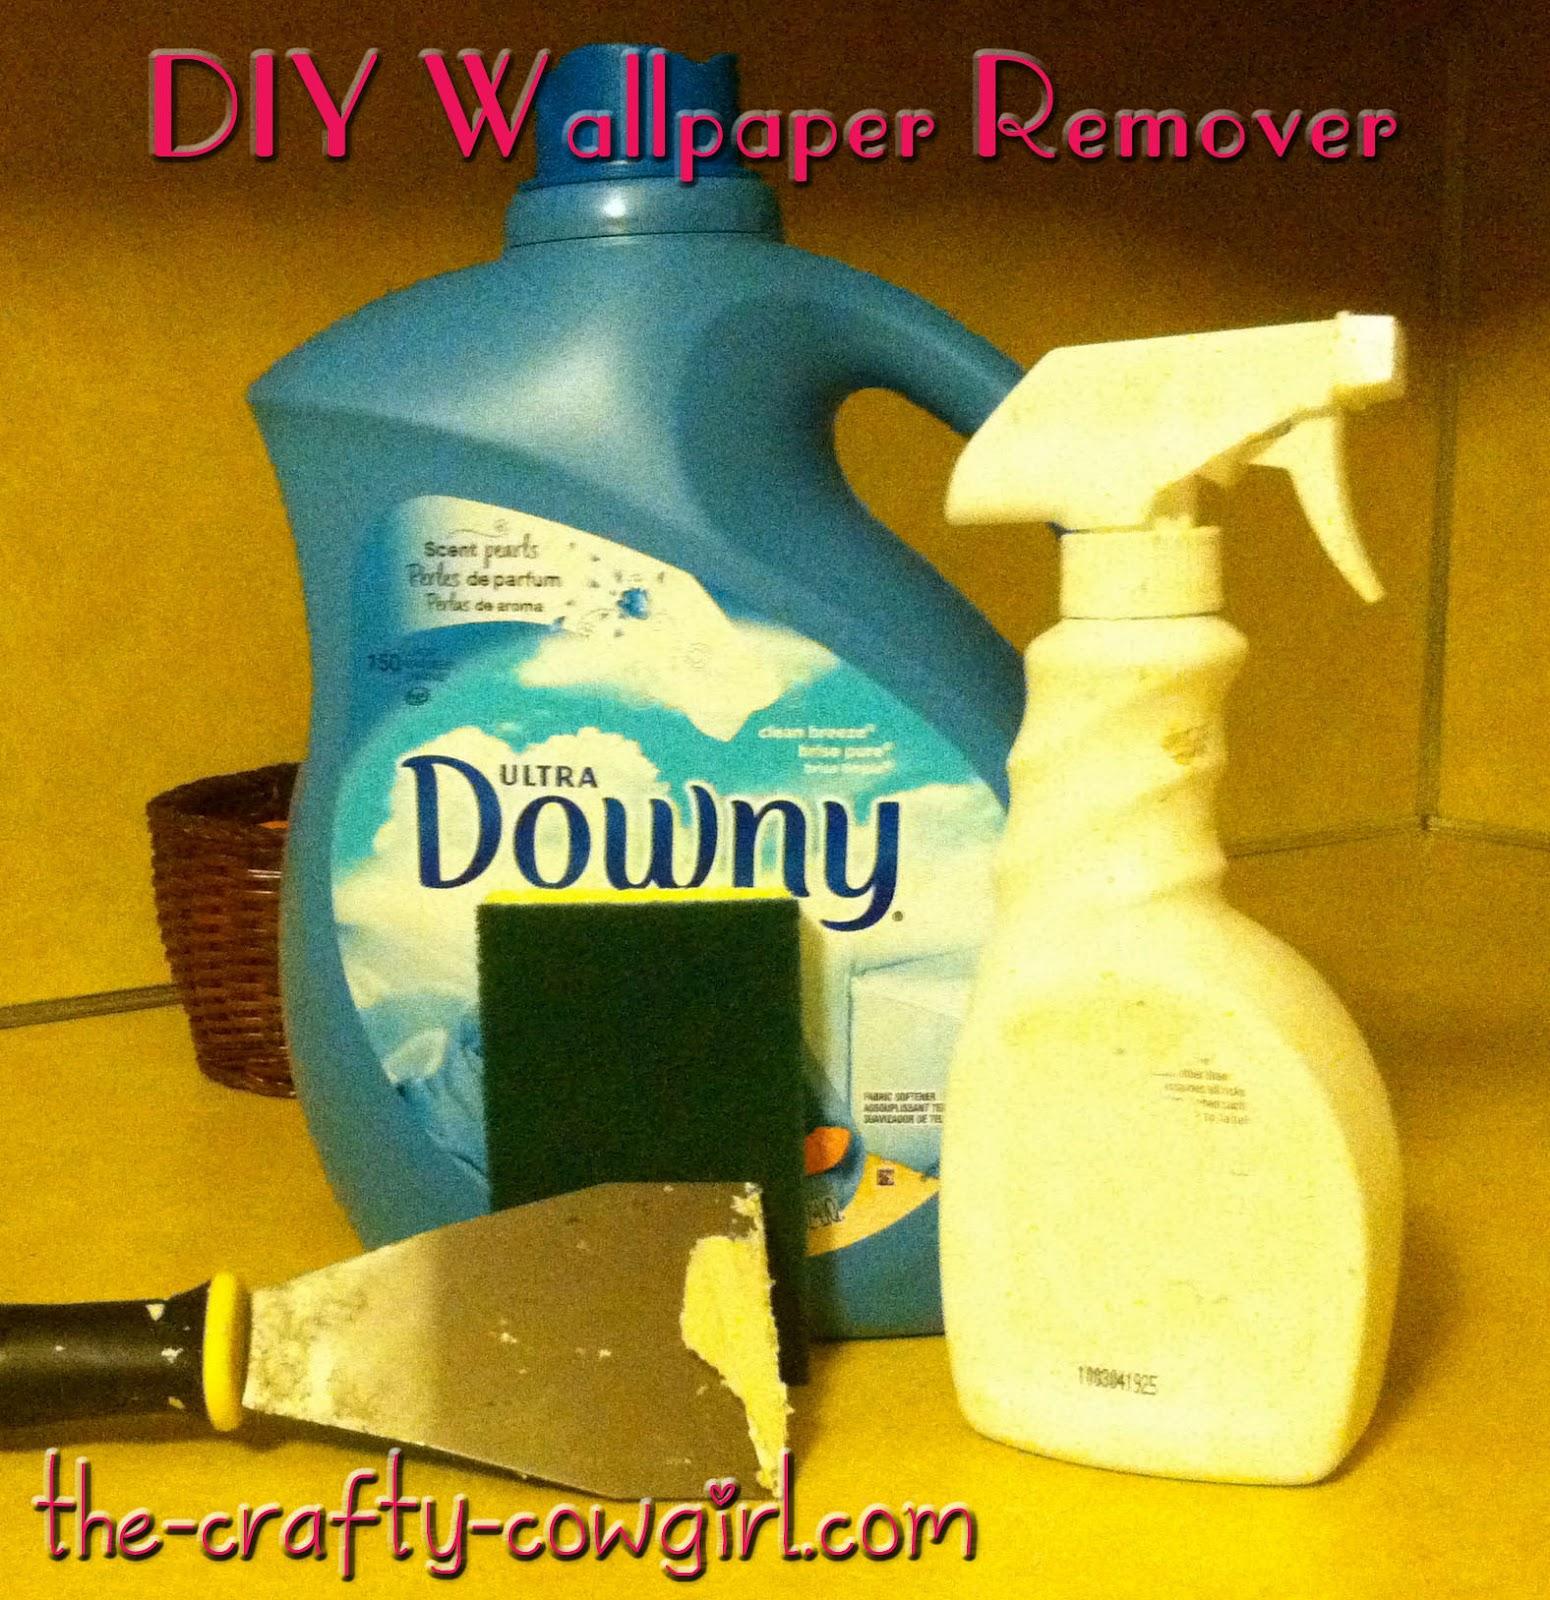 50+] Wallpaper Removal Fabric Softener